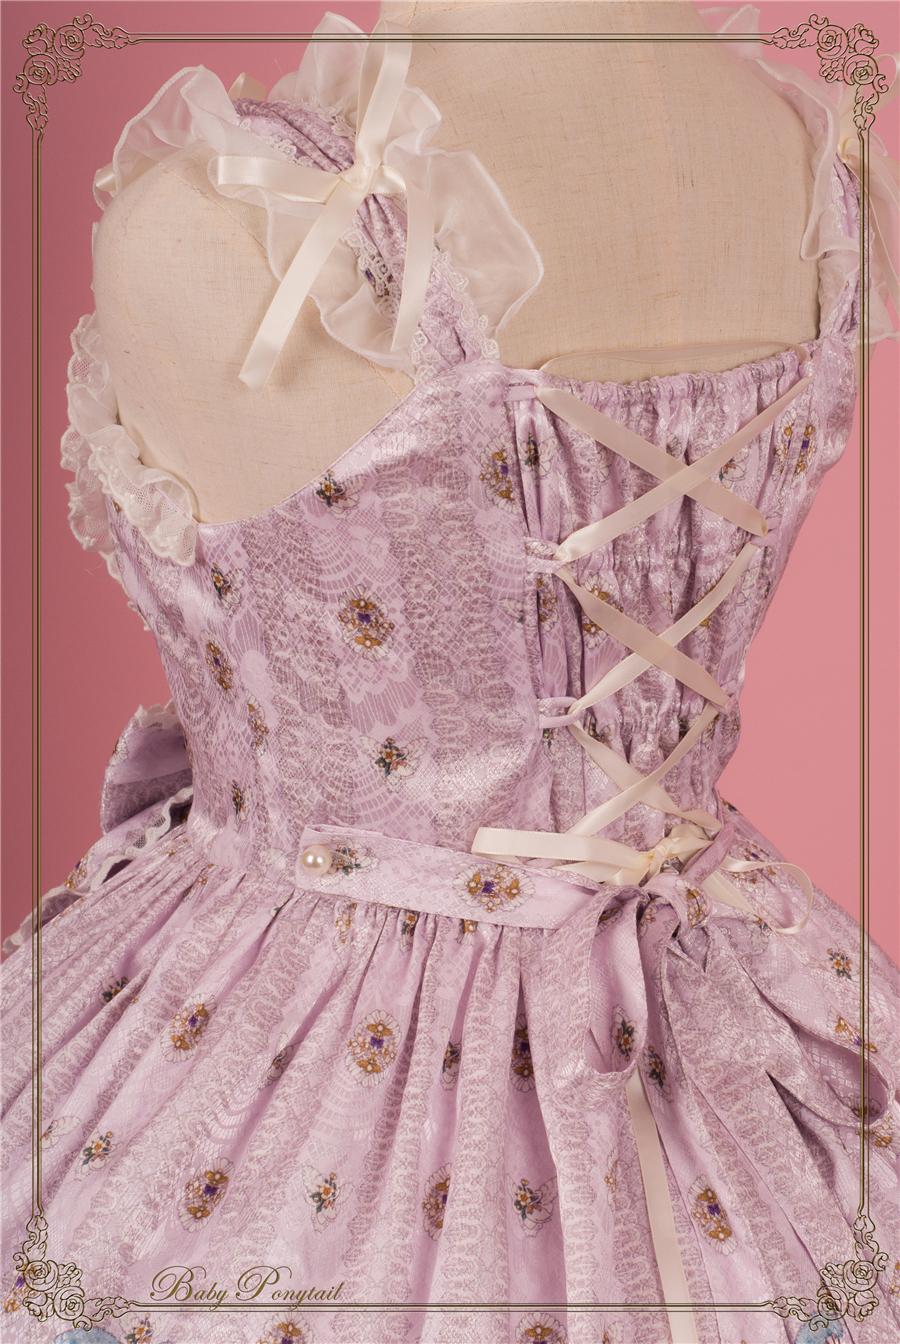 BabyPonytail_Stock Photo_My Favorite Companion_JSK Lavender_10.jpg